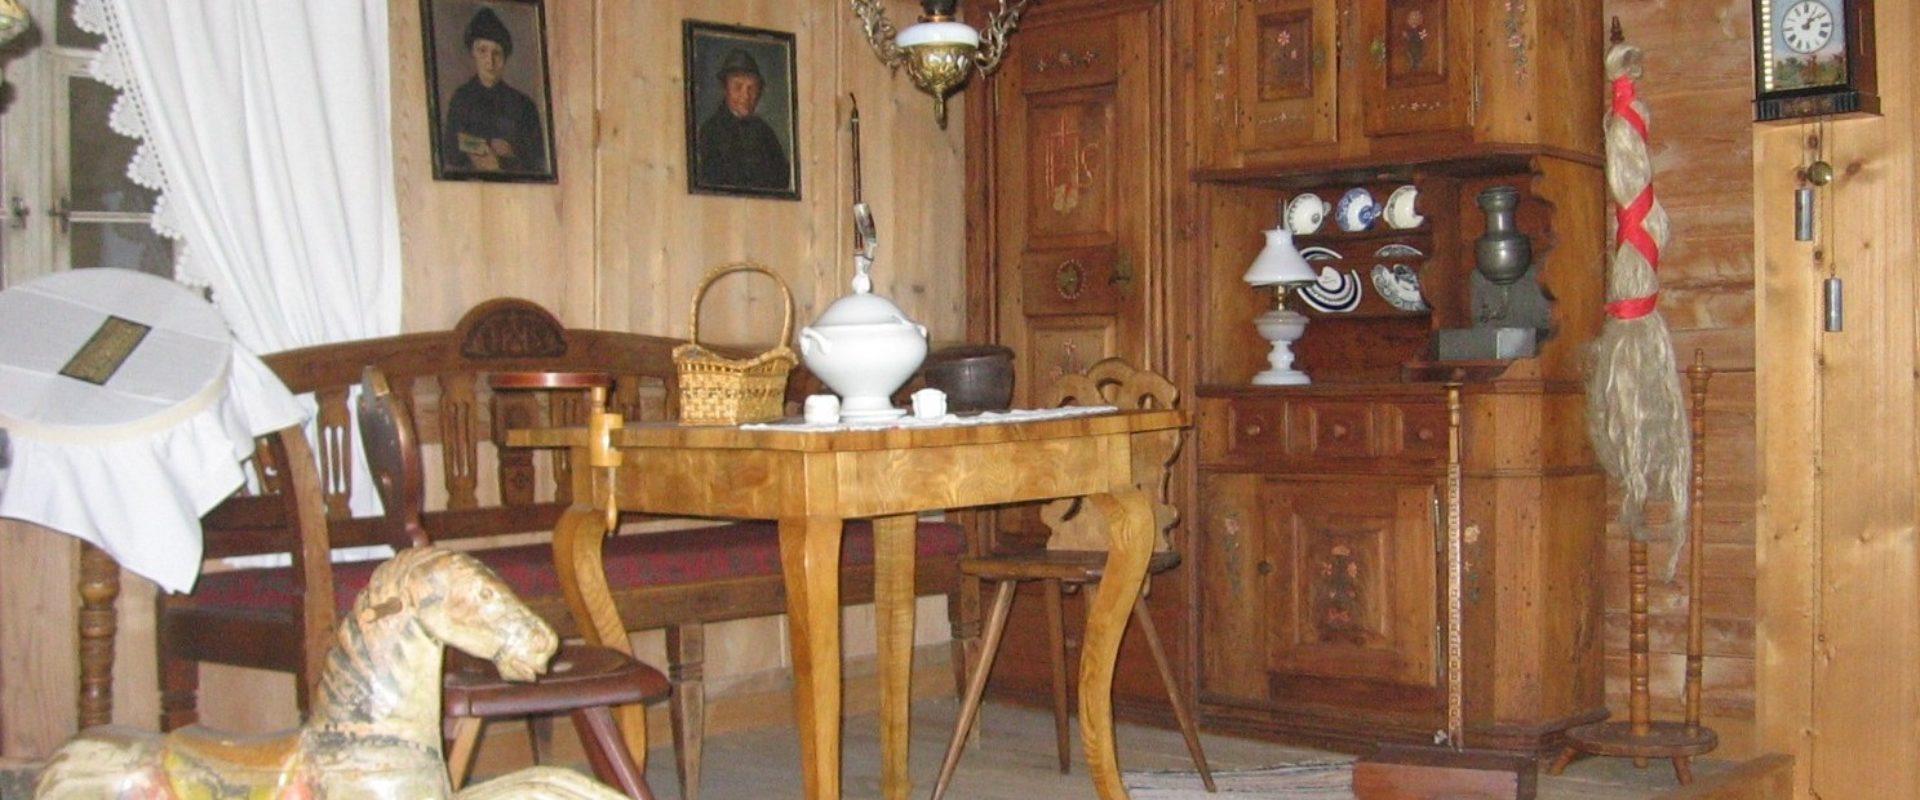 Heimatmuseum alberschwende (2)